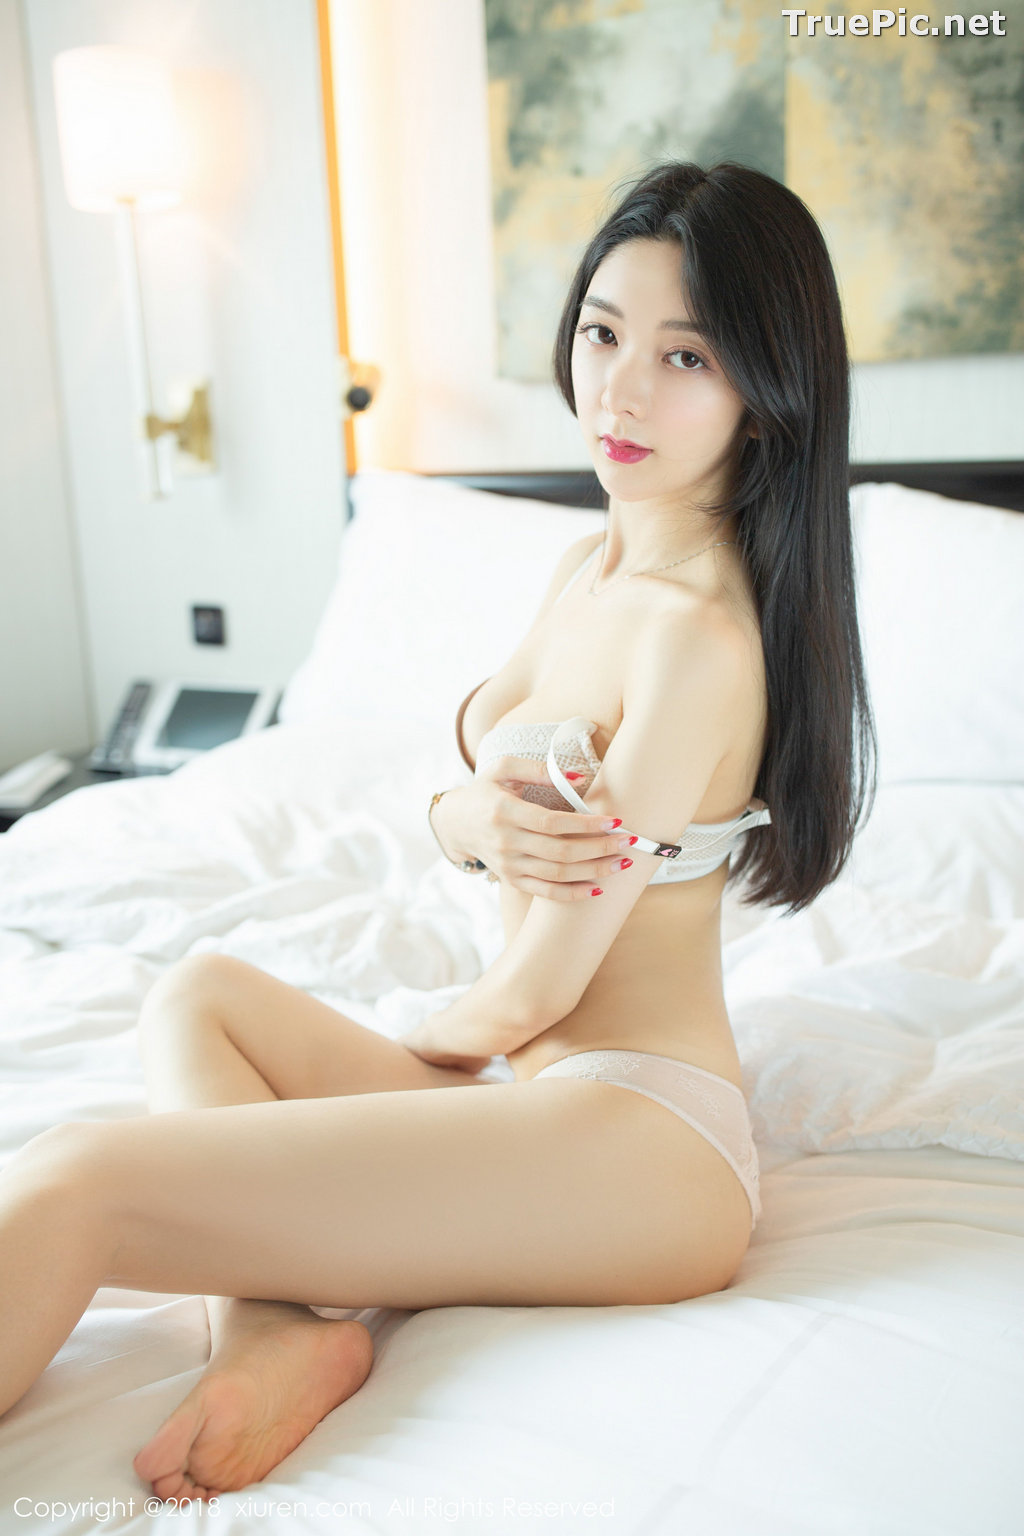 Image XIUREN No.1141 - Chinese Model - Xiao Reba (Angela小热巴) - Sexy Dress Tonight - TruePic.net - Picture-44